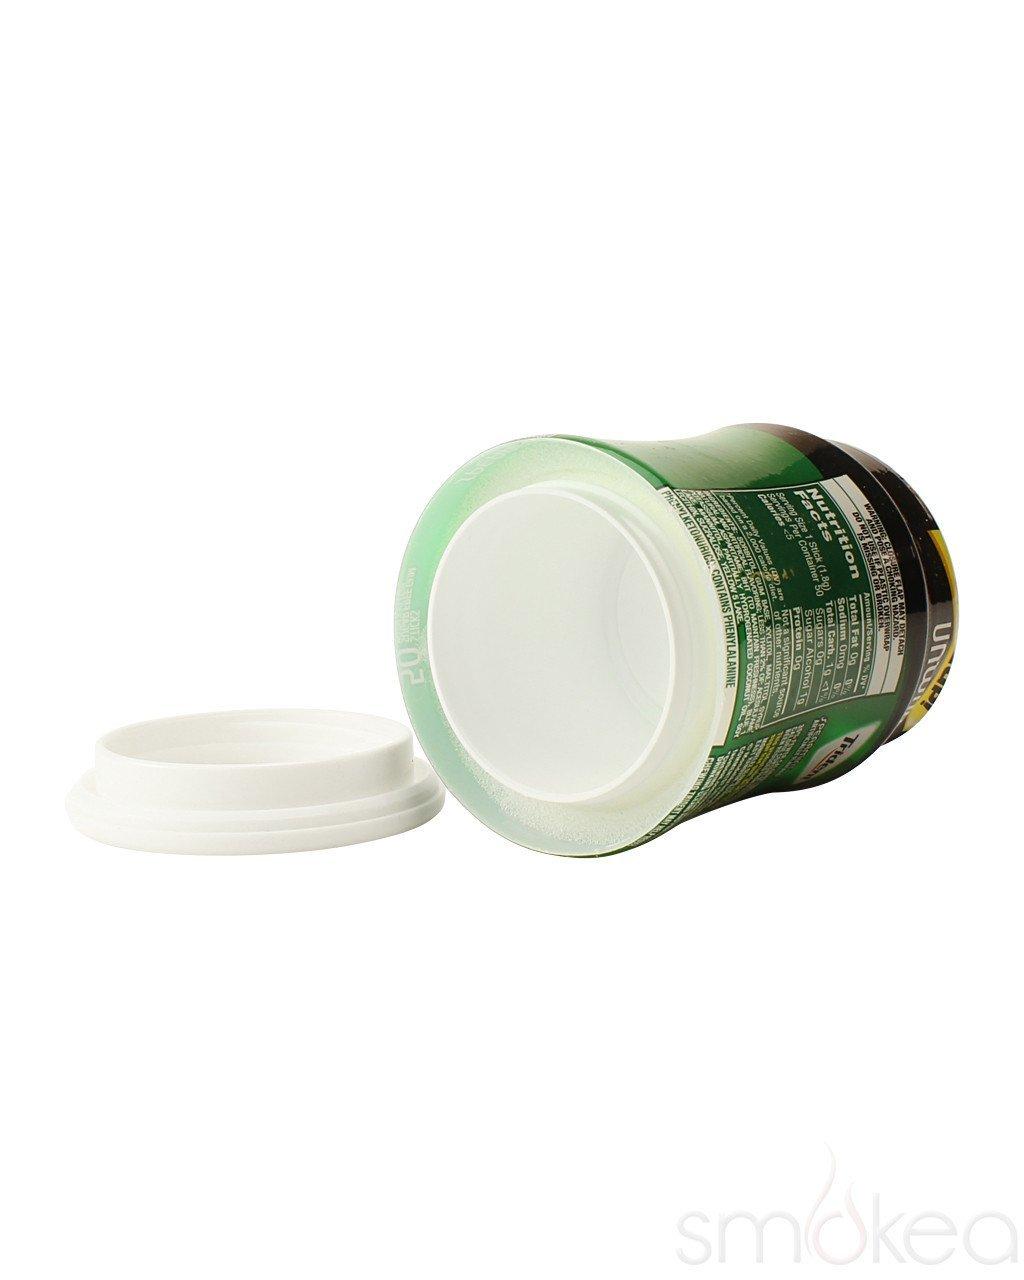 Trident Tropical Twist Gum Diversion Safe Stash